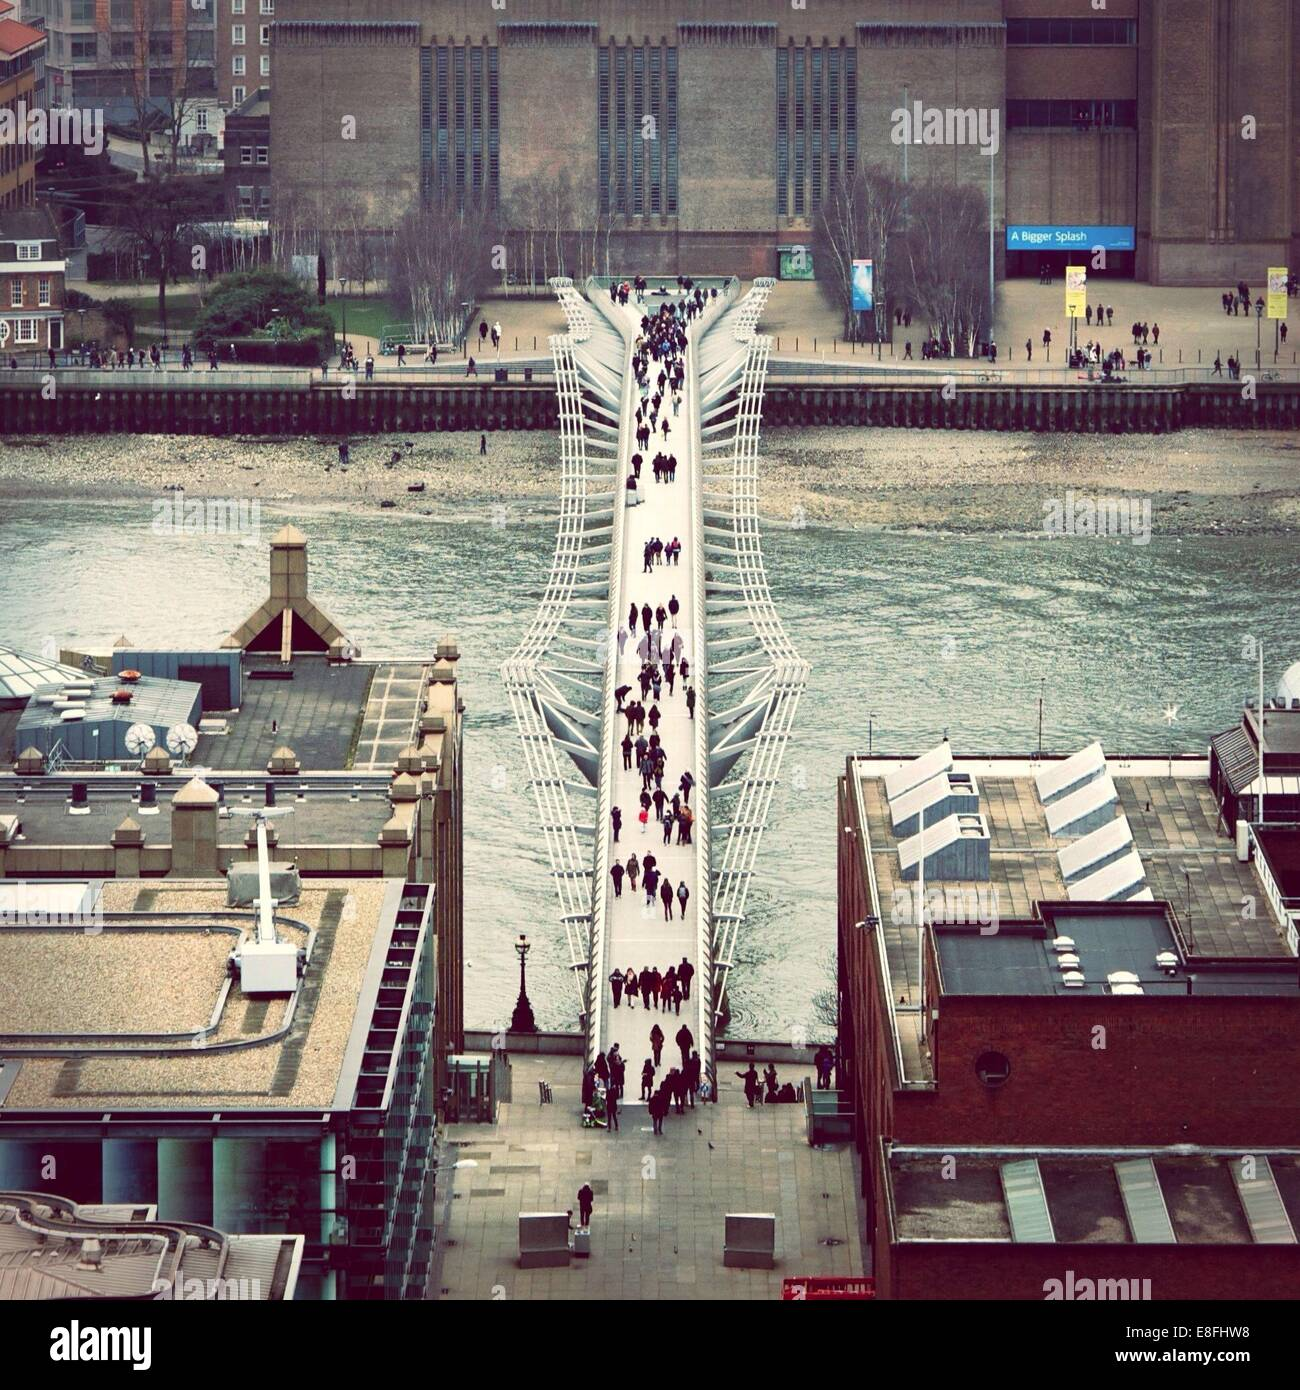 United Kingdom, London, Greater London, Millennium Bridge - Stock Image